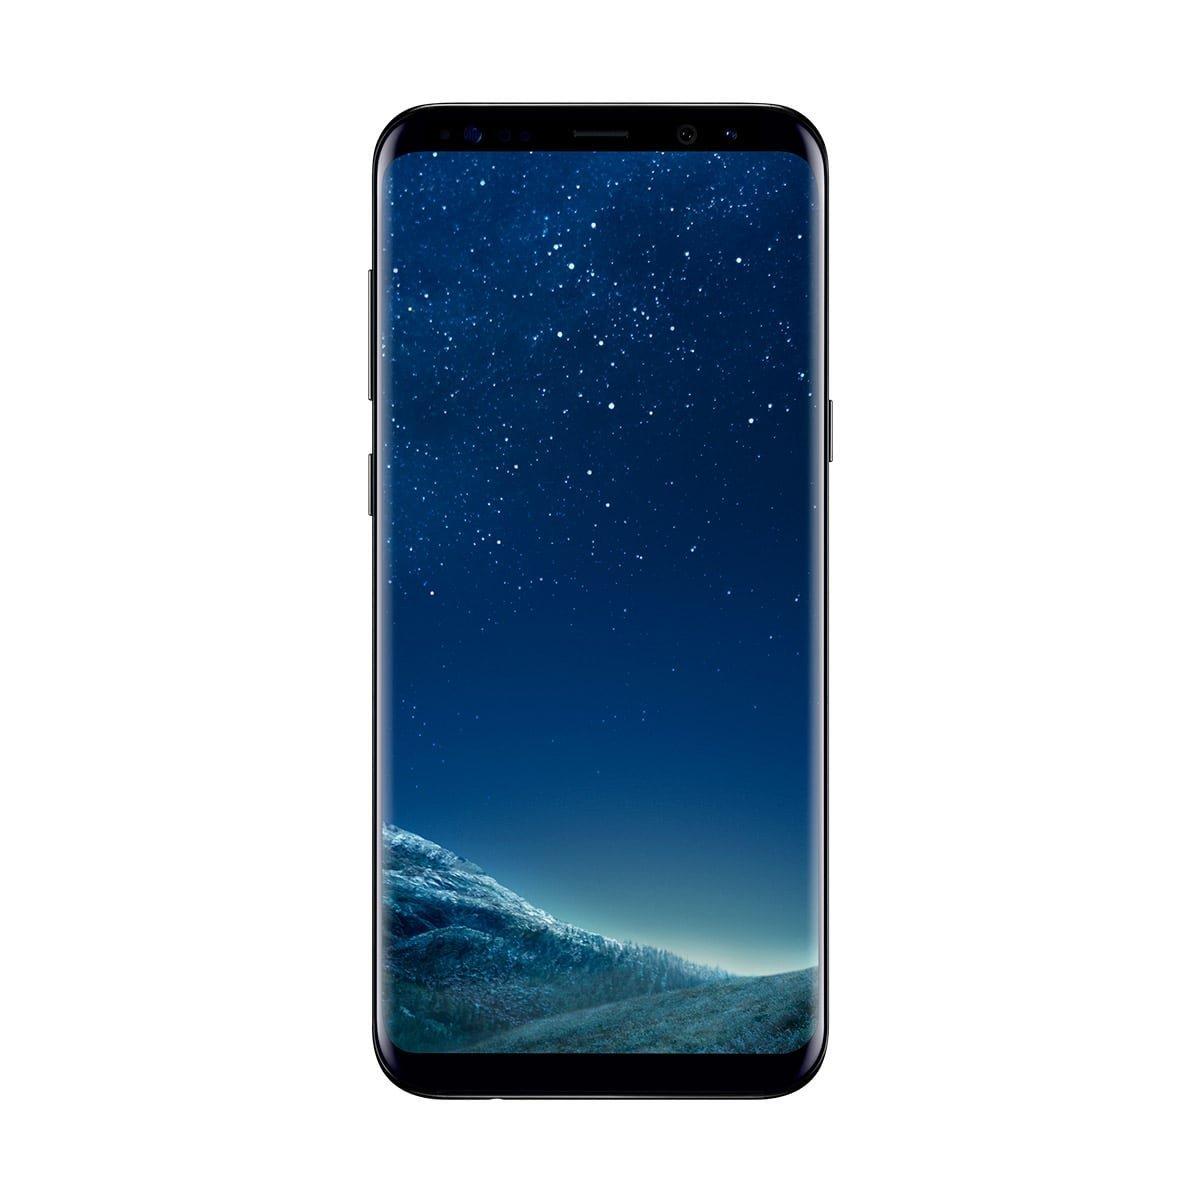 Samsung Galaxy S8 Plus imagen